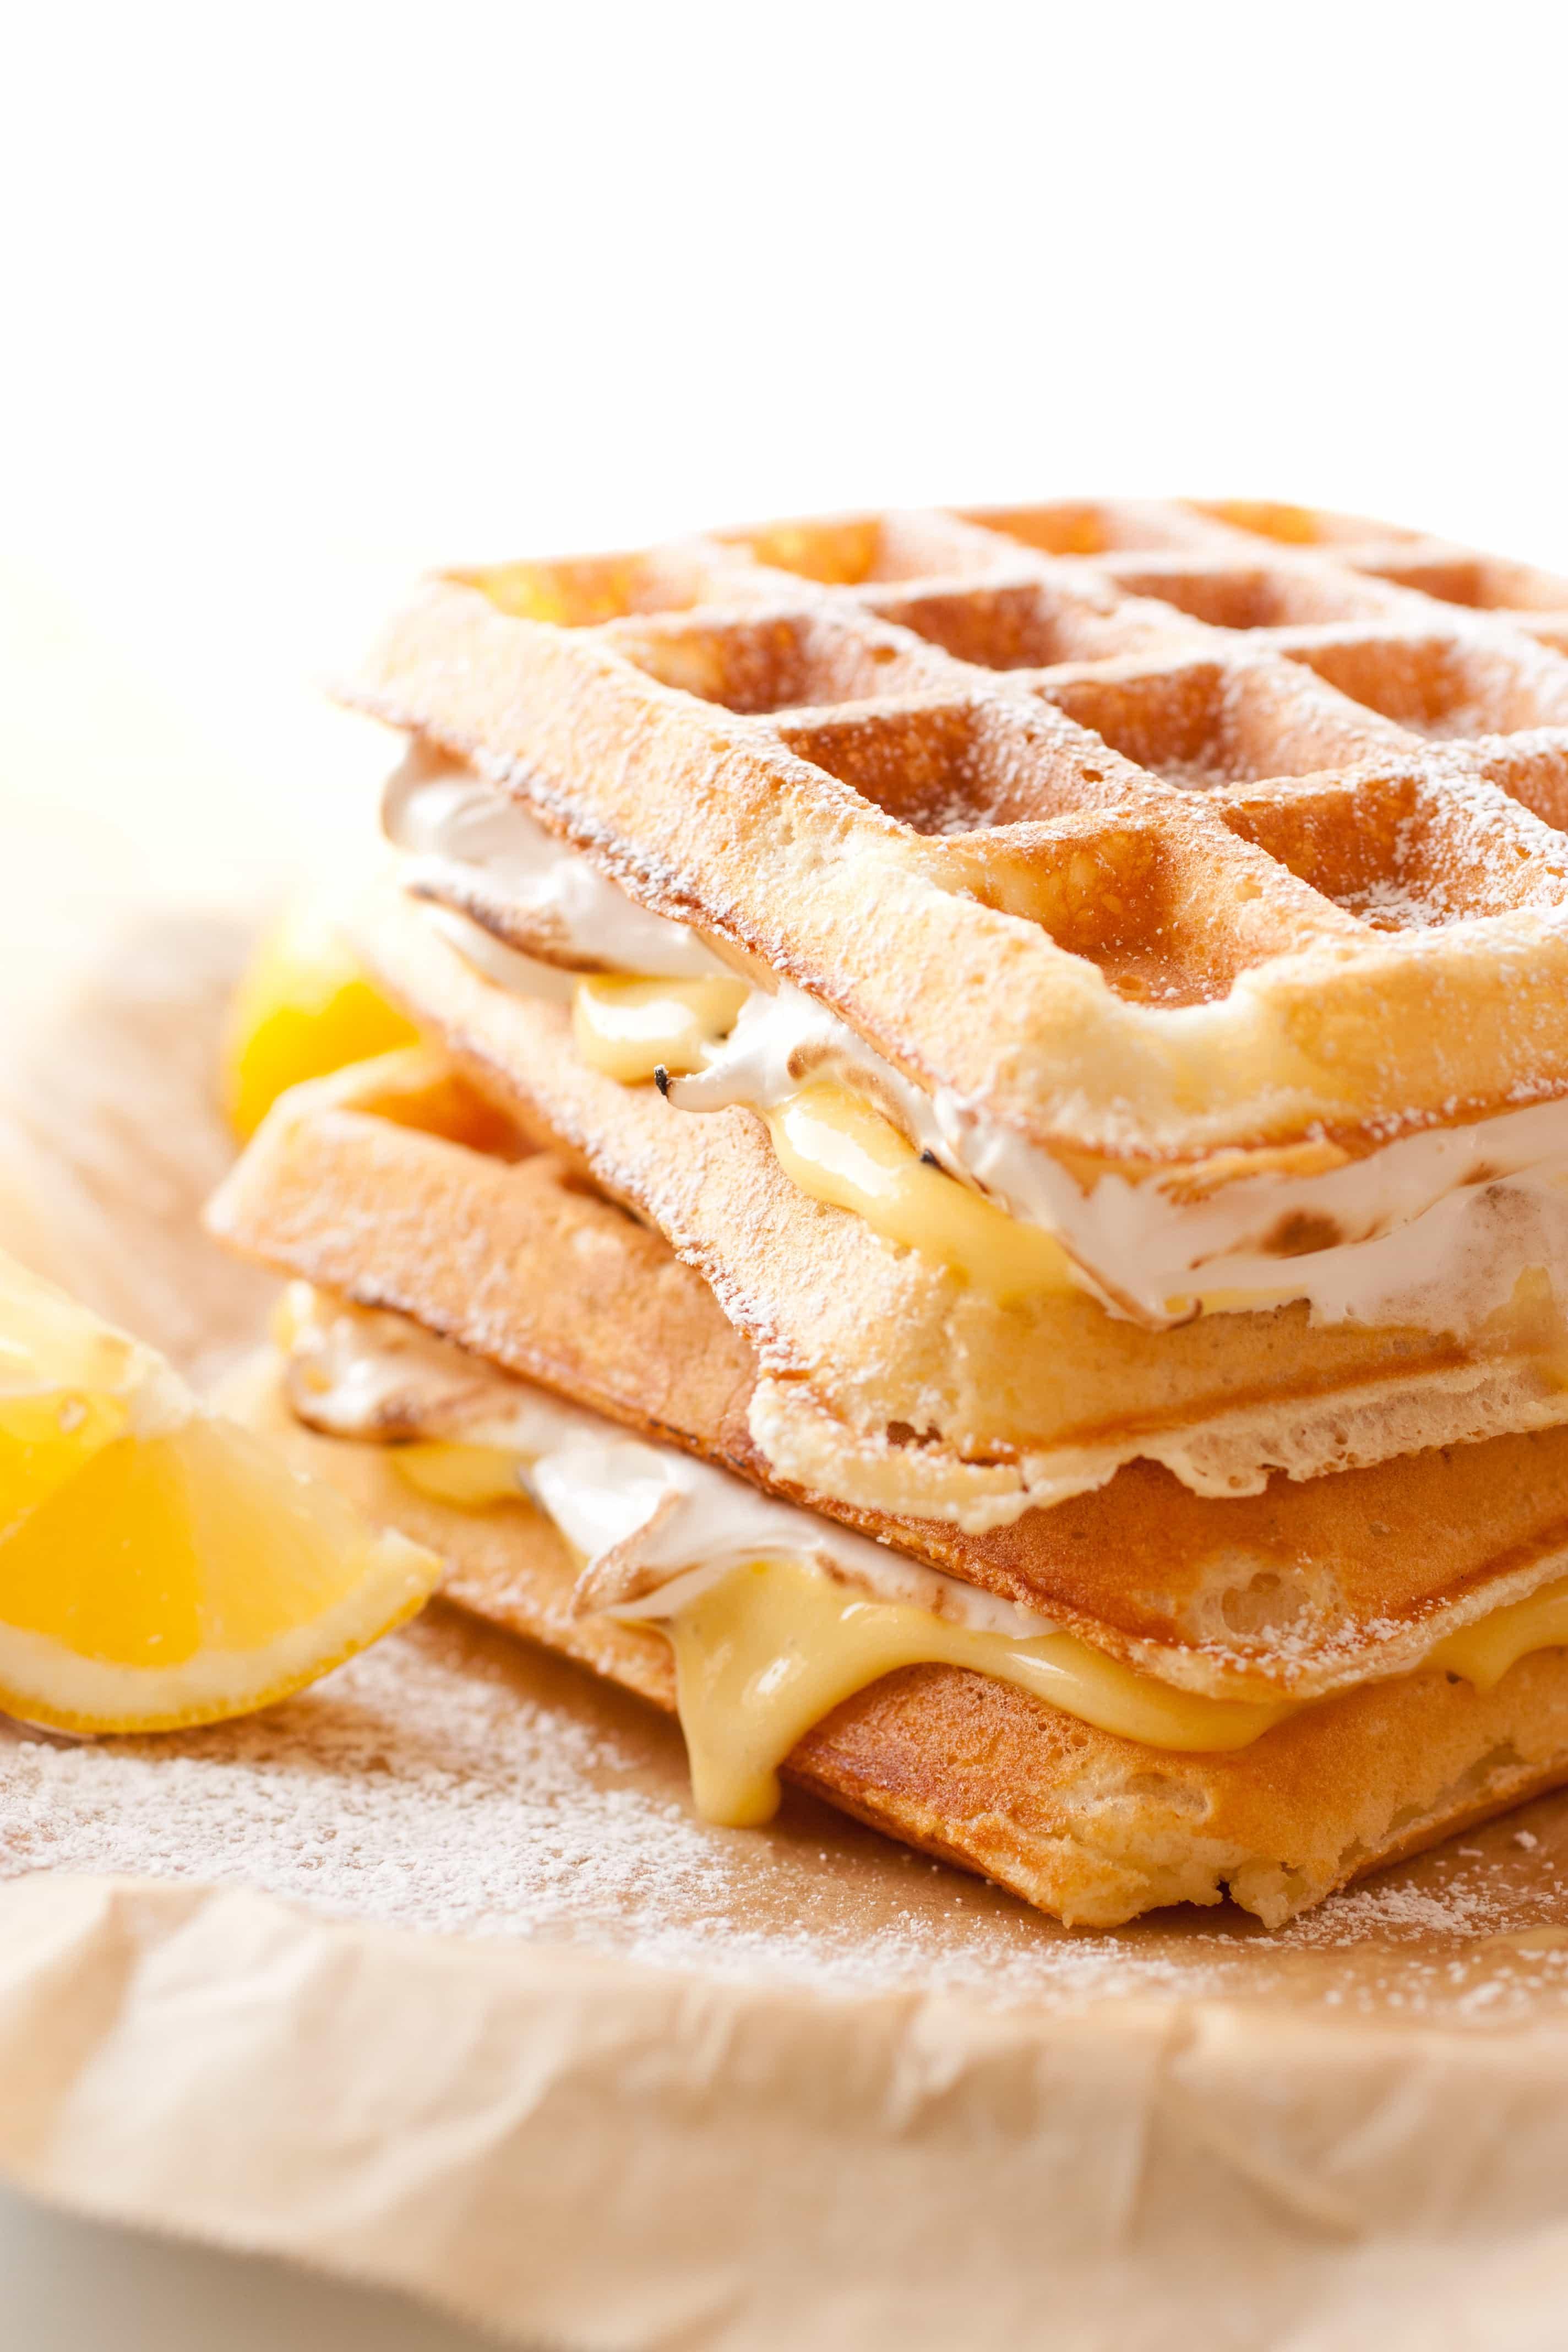 Not skilled village waffle irka